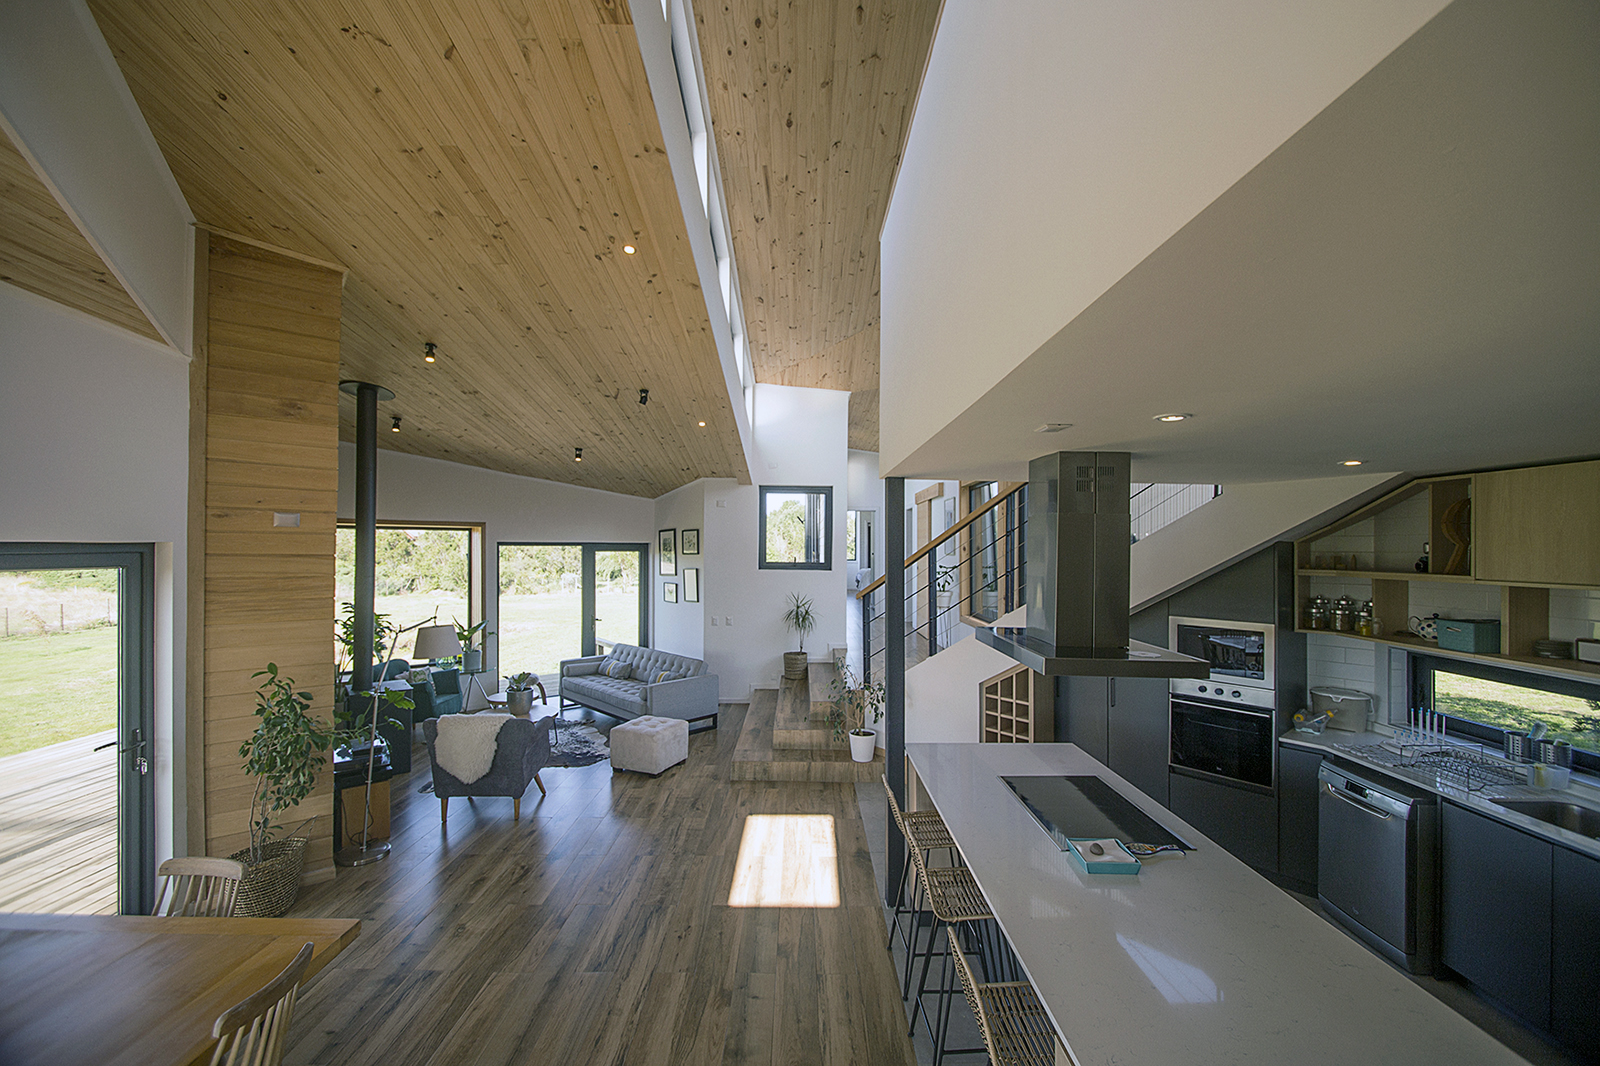 Foto de interior de Casa Volcán